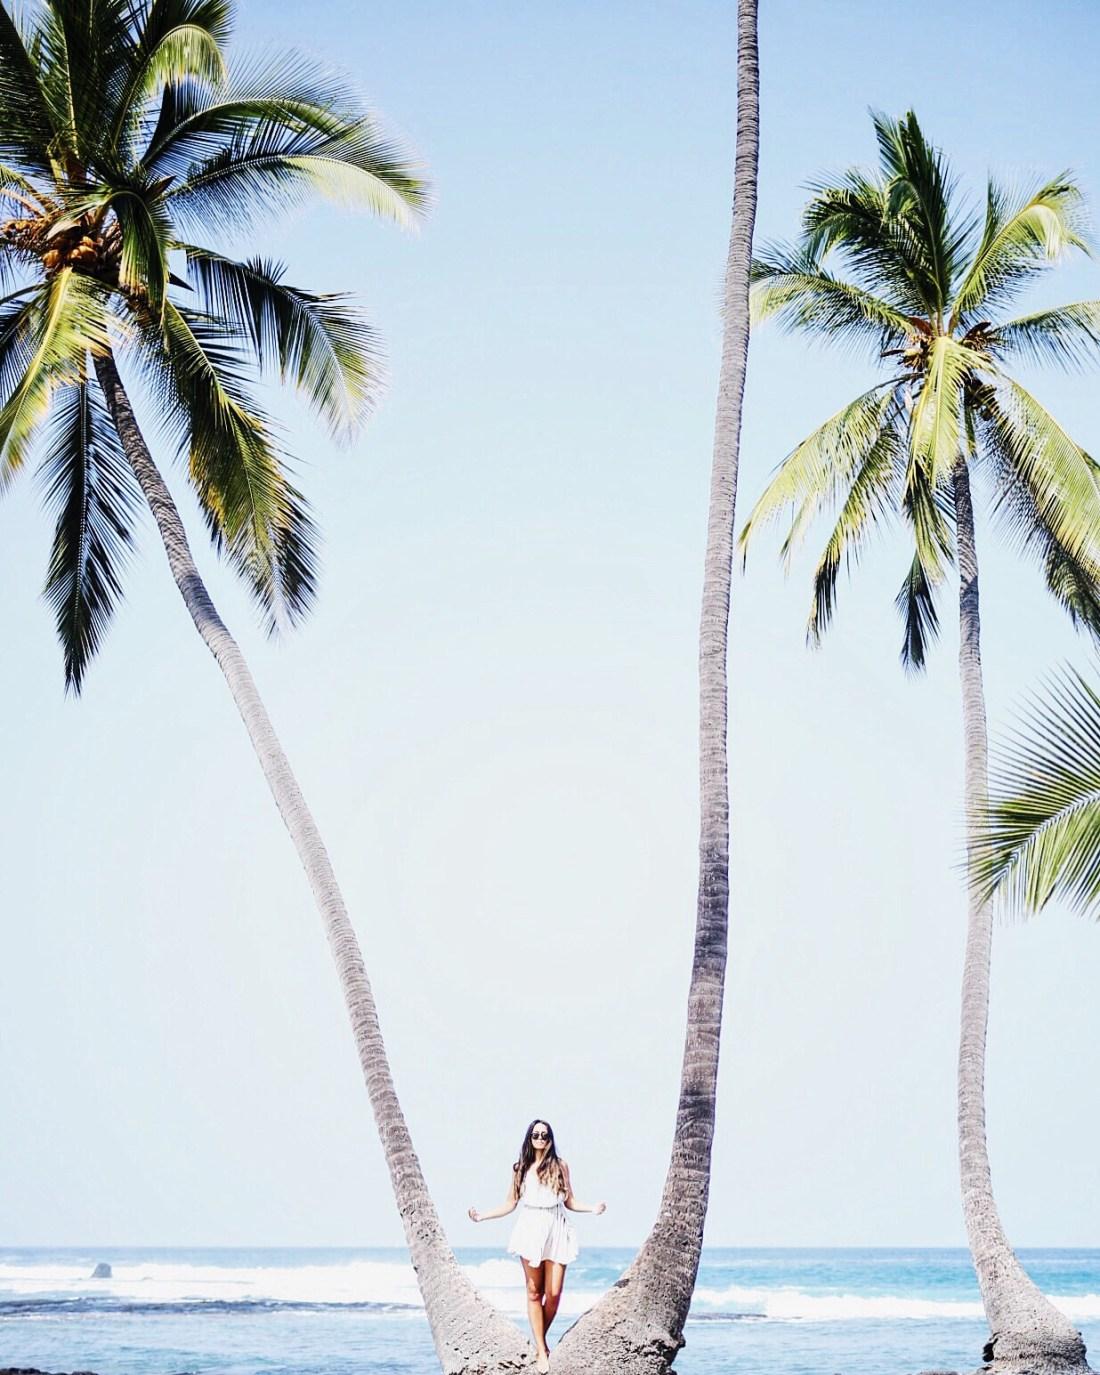 Where to Shop in Hawaii | Where to Shop on the Big Island of Hawaii | Best Things To Do In Hawaii | Ultimate Big Island Travel Guide | Hawaii Travel Guide | Kona Hawaii | Hilo Hawaii | Traveling to Hawaii | Things To Do In Hawaii | Vacationing to the Big Island of Hawaii | What To Do On The Big Island of Hawaii | via @elanaloo + elanaloo.com